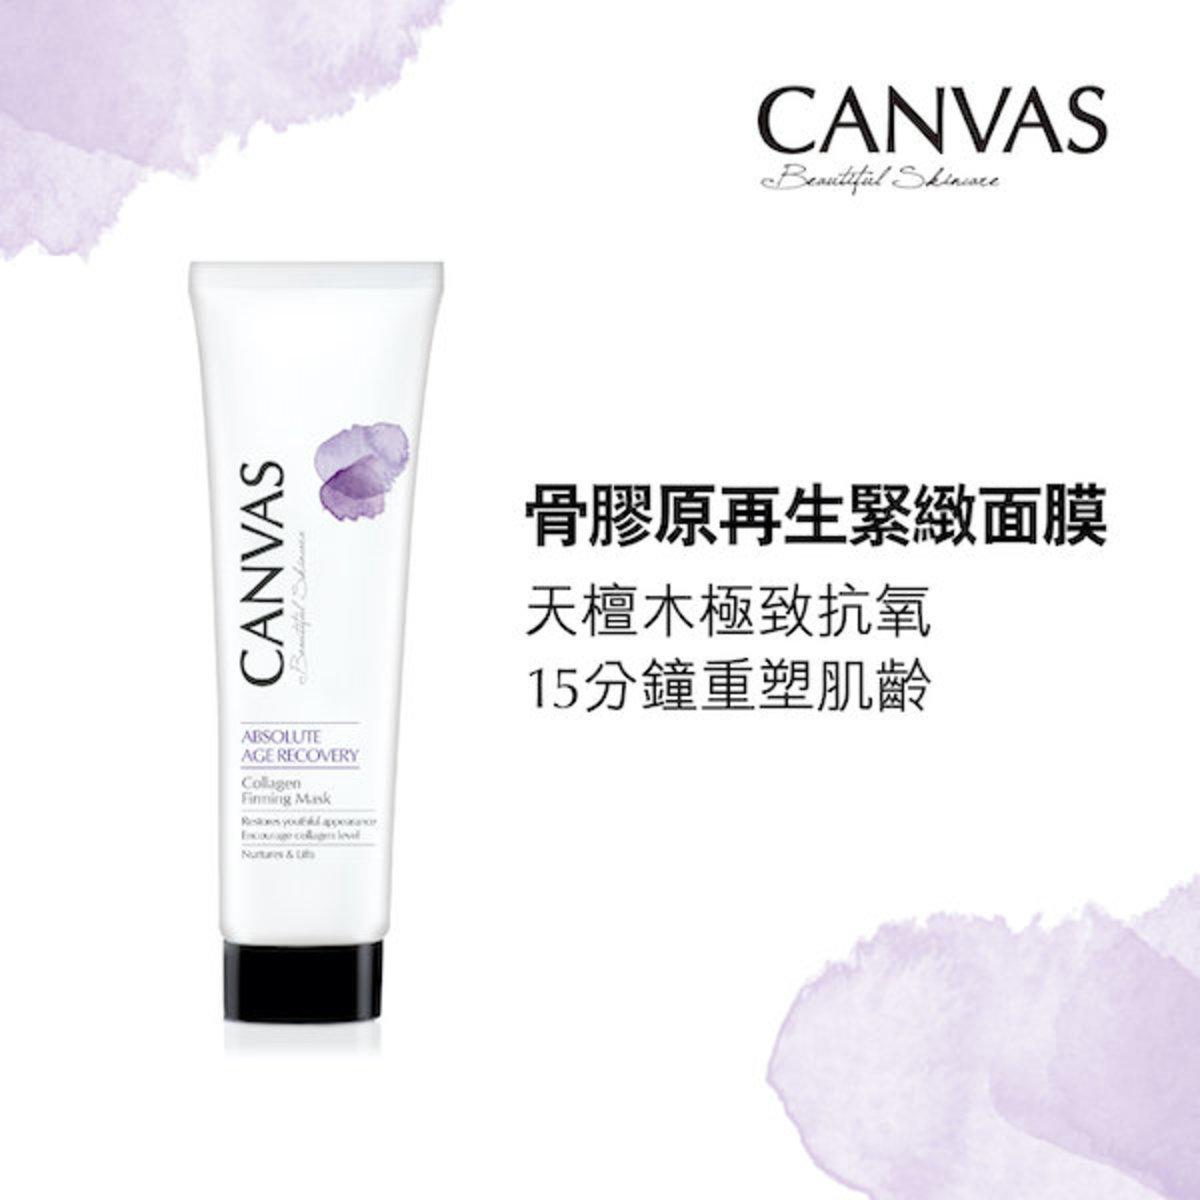 Collagen Firming Mask